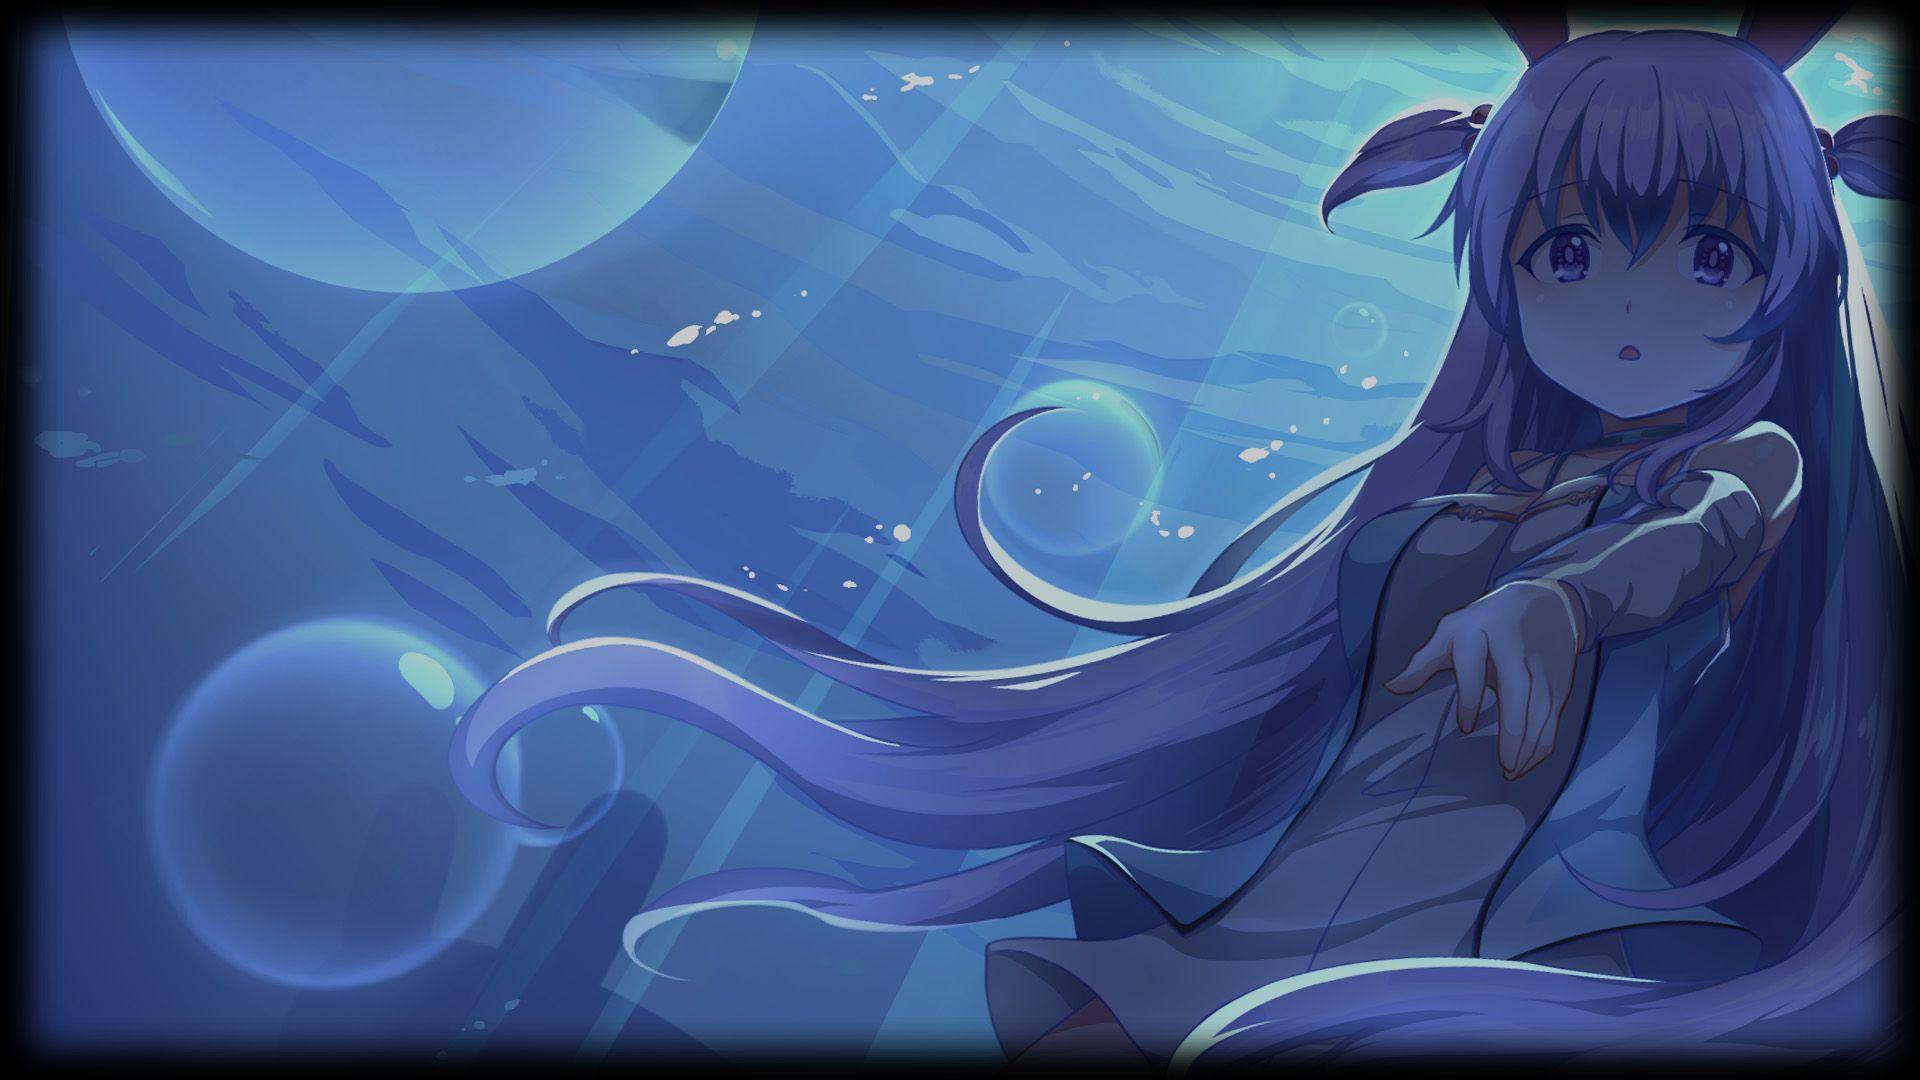 Anime Thunder Wallpapers - Top Free Anime Thunder ...